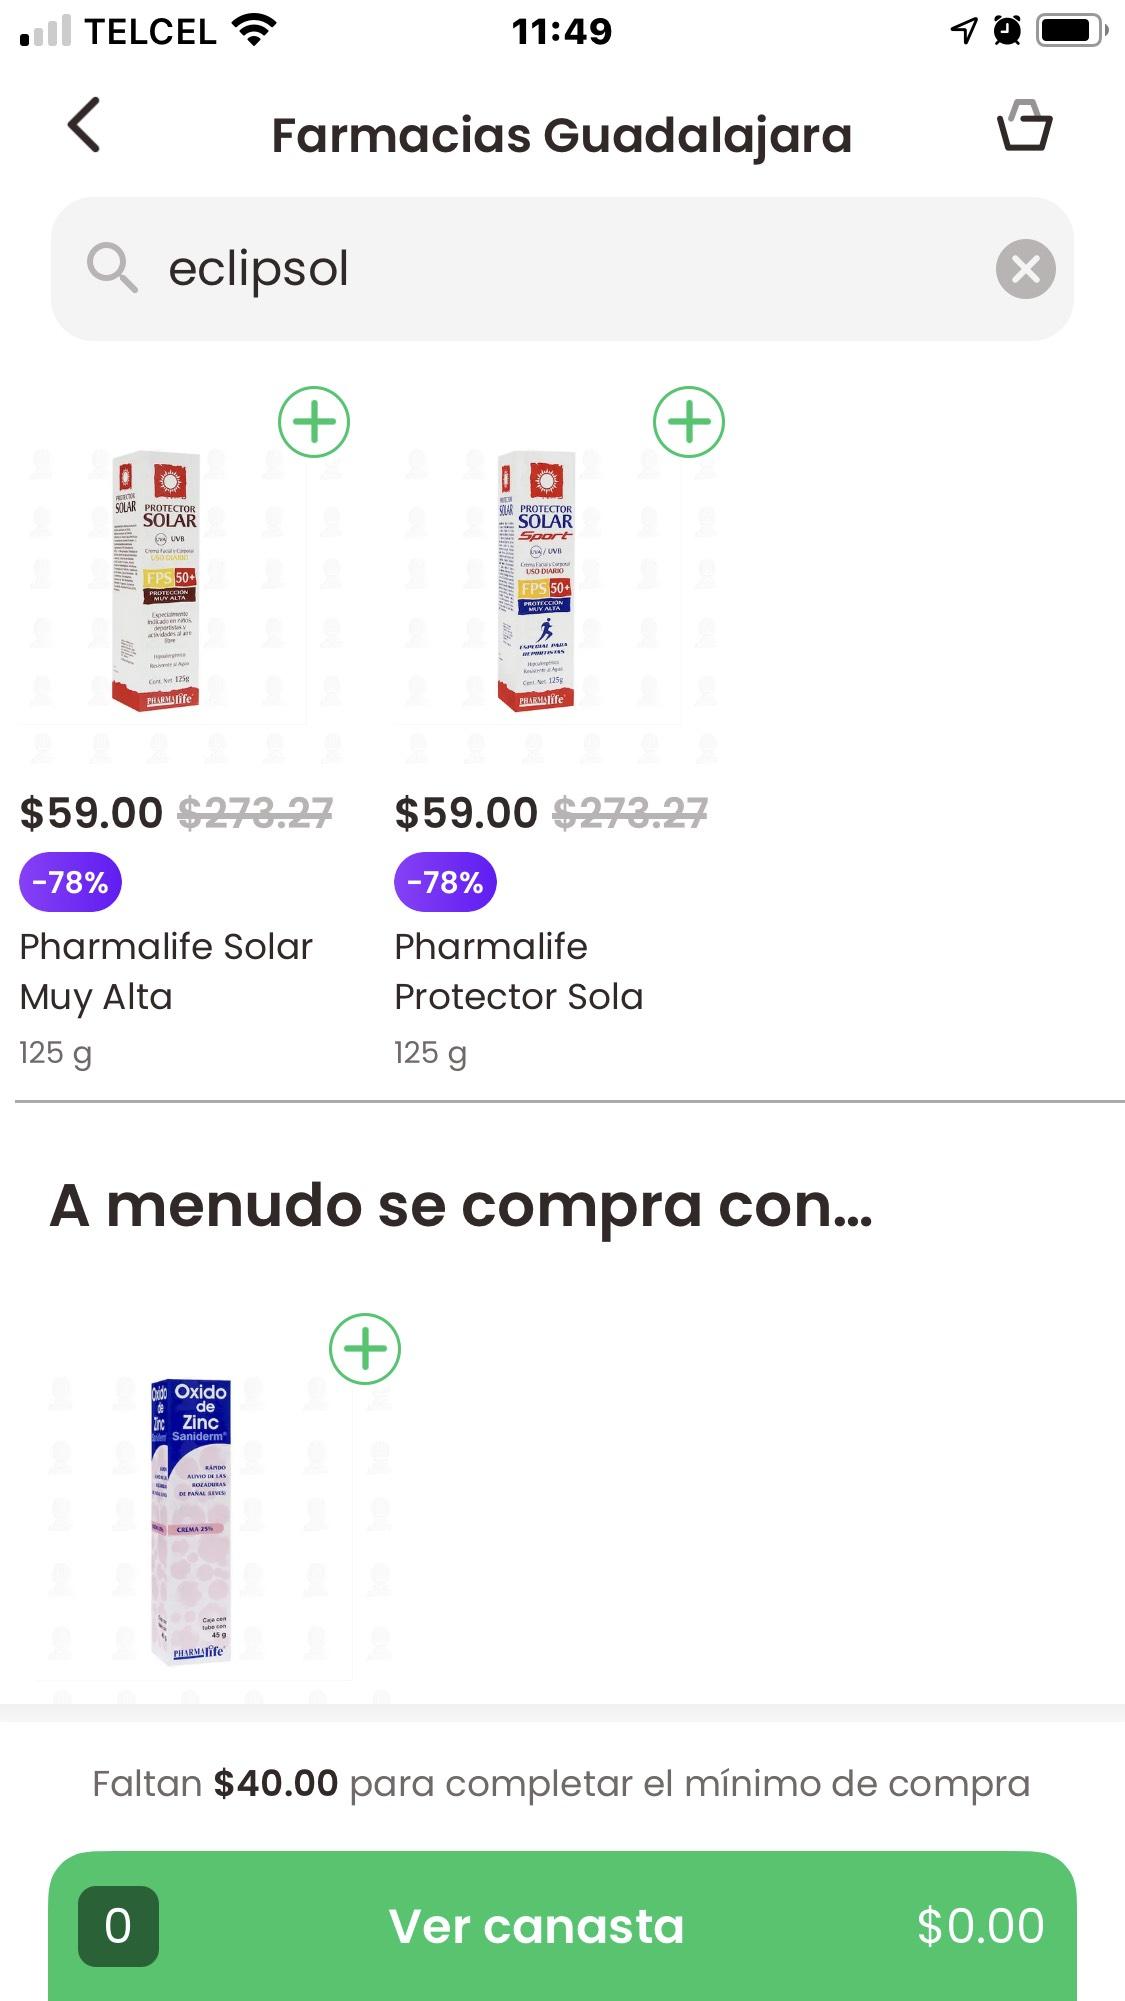 Farmacia Guadalajara: Protector Solar Pharmalife